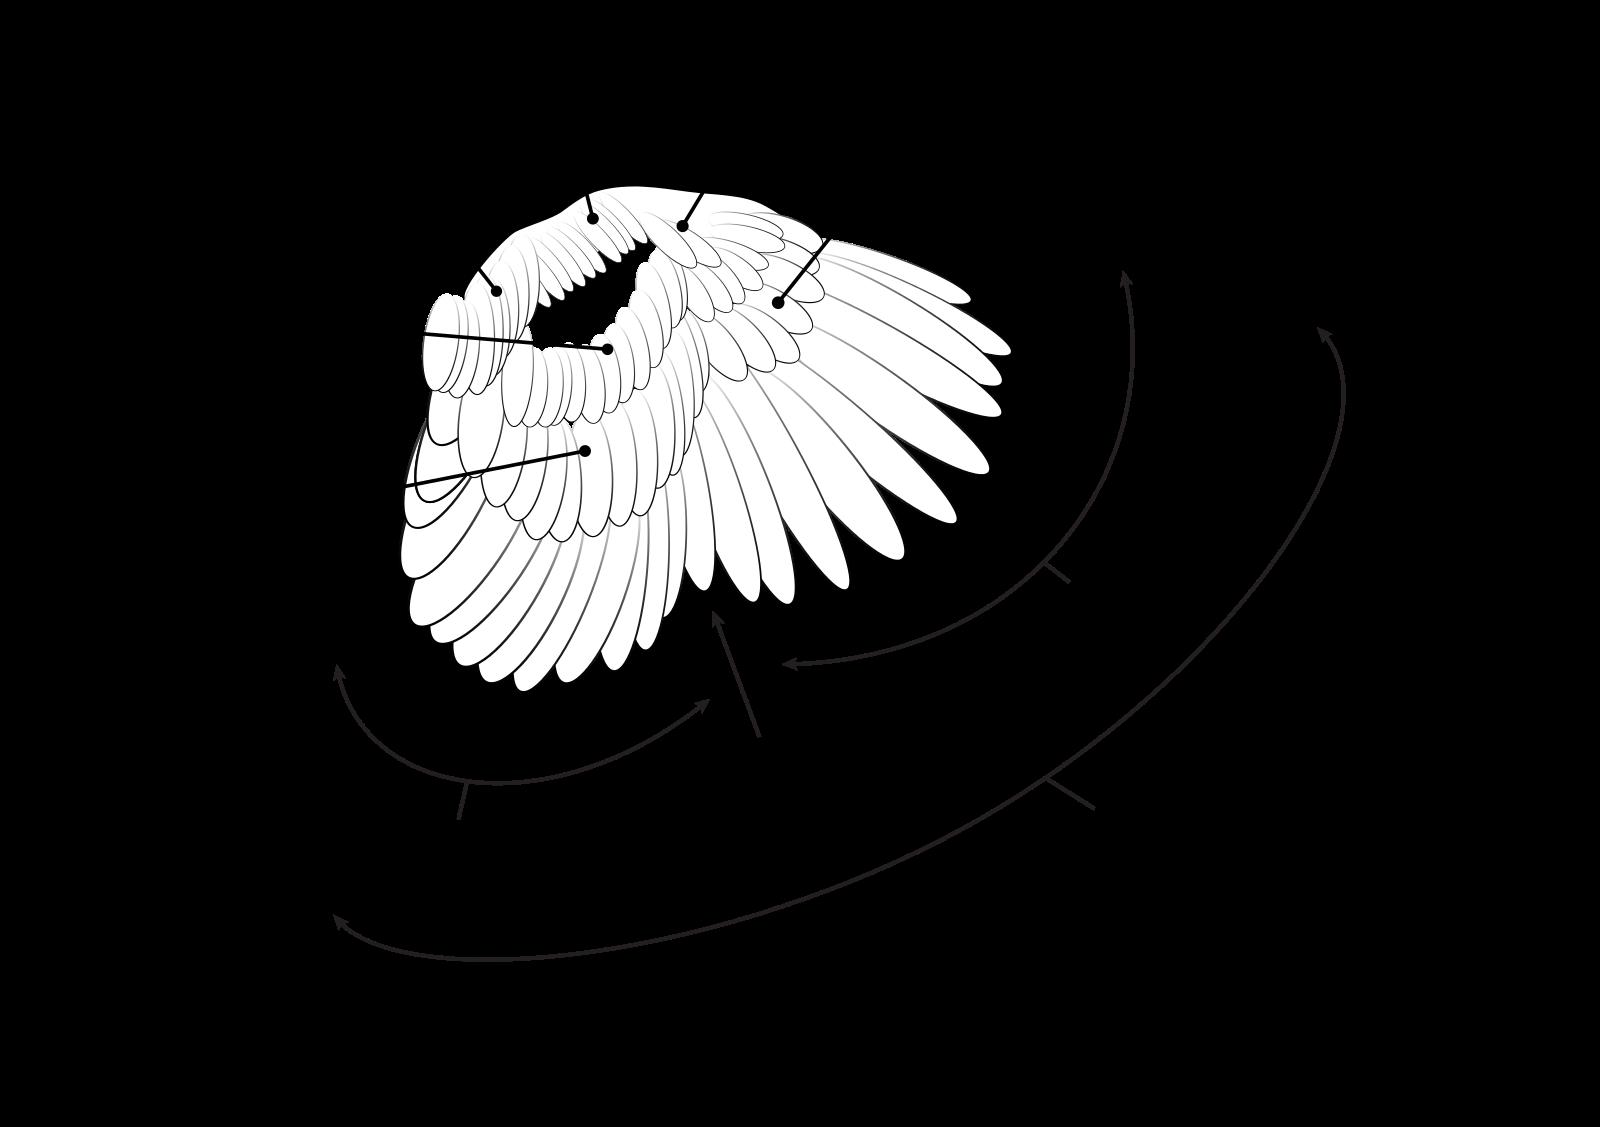 File:Chicken wing.svg | Bird Anatomy | Pinterest | Filing and Bird